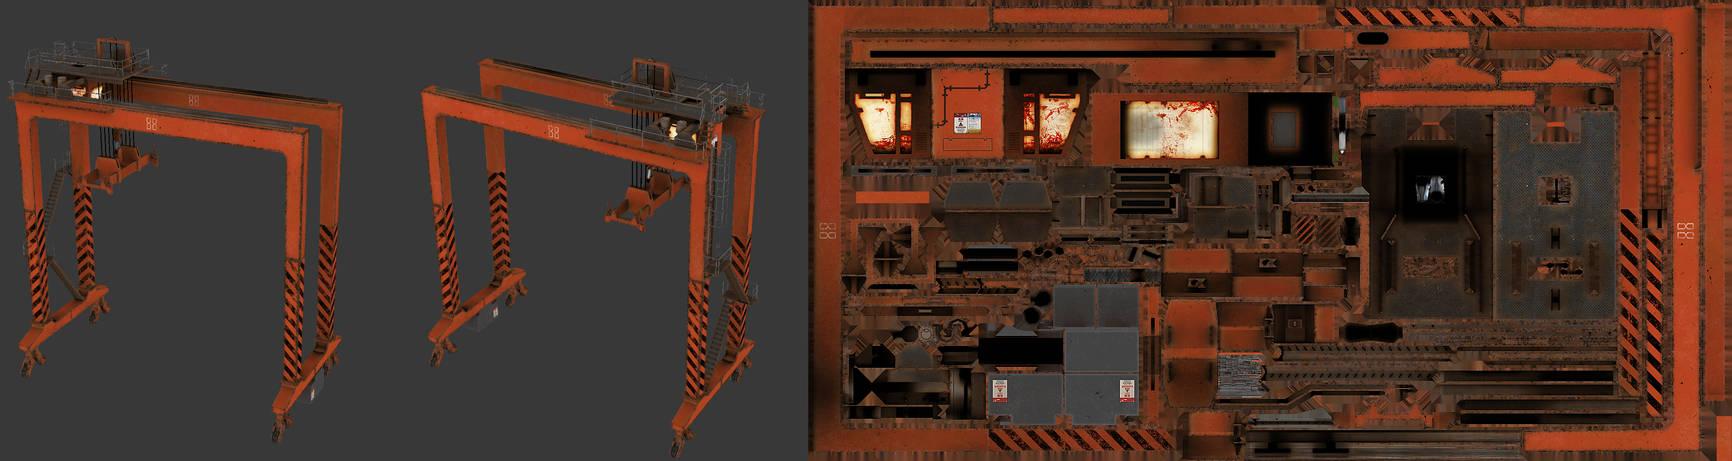 Killing Floor - Large Dock Crane